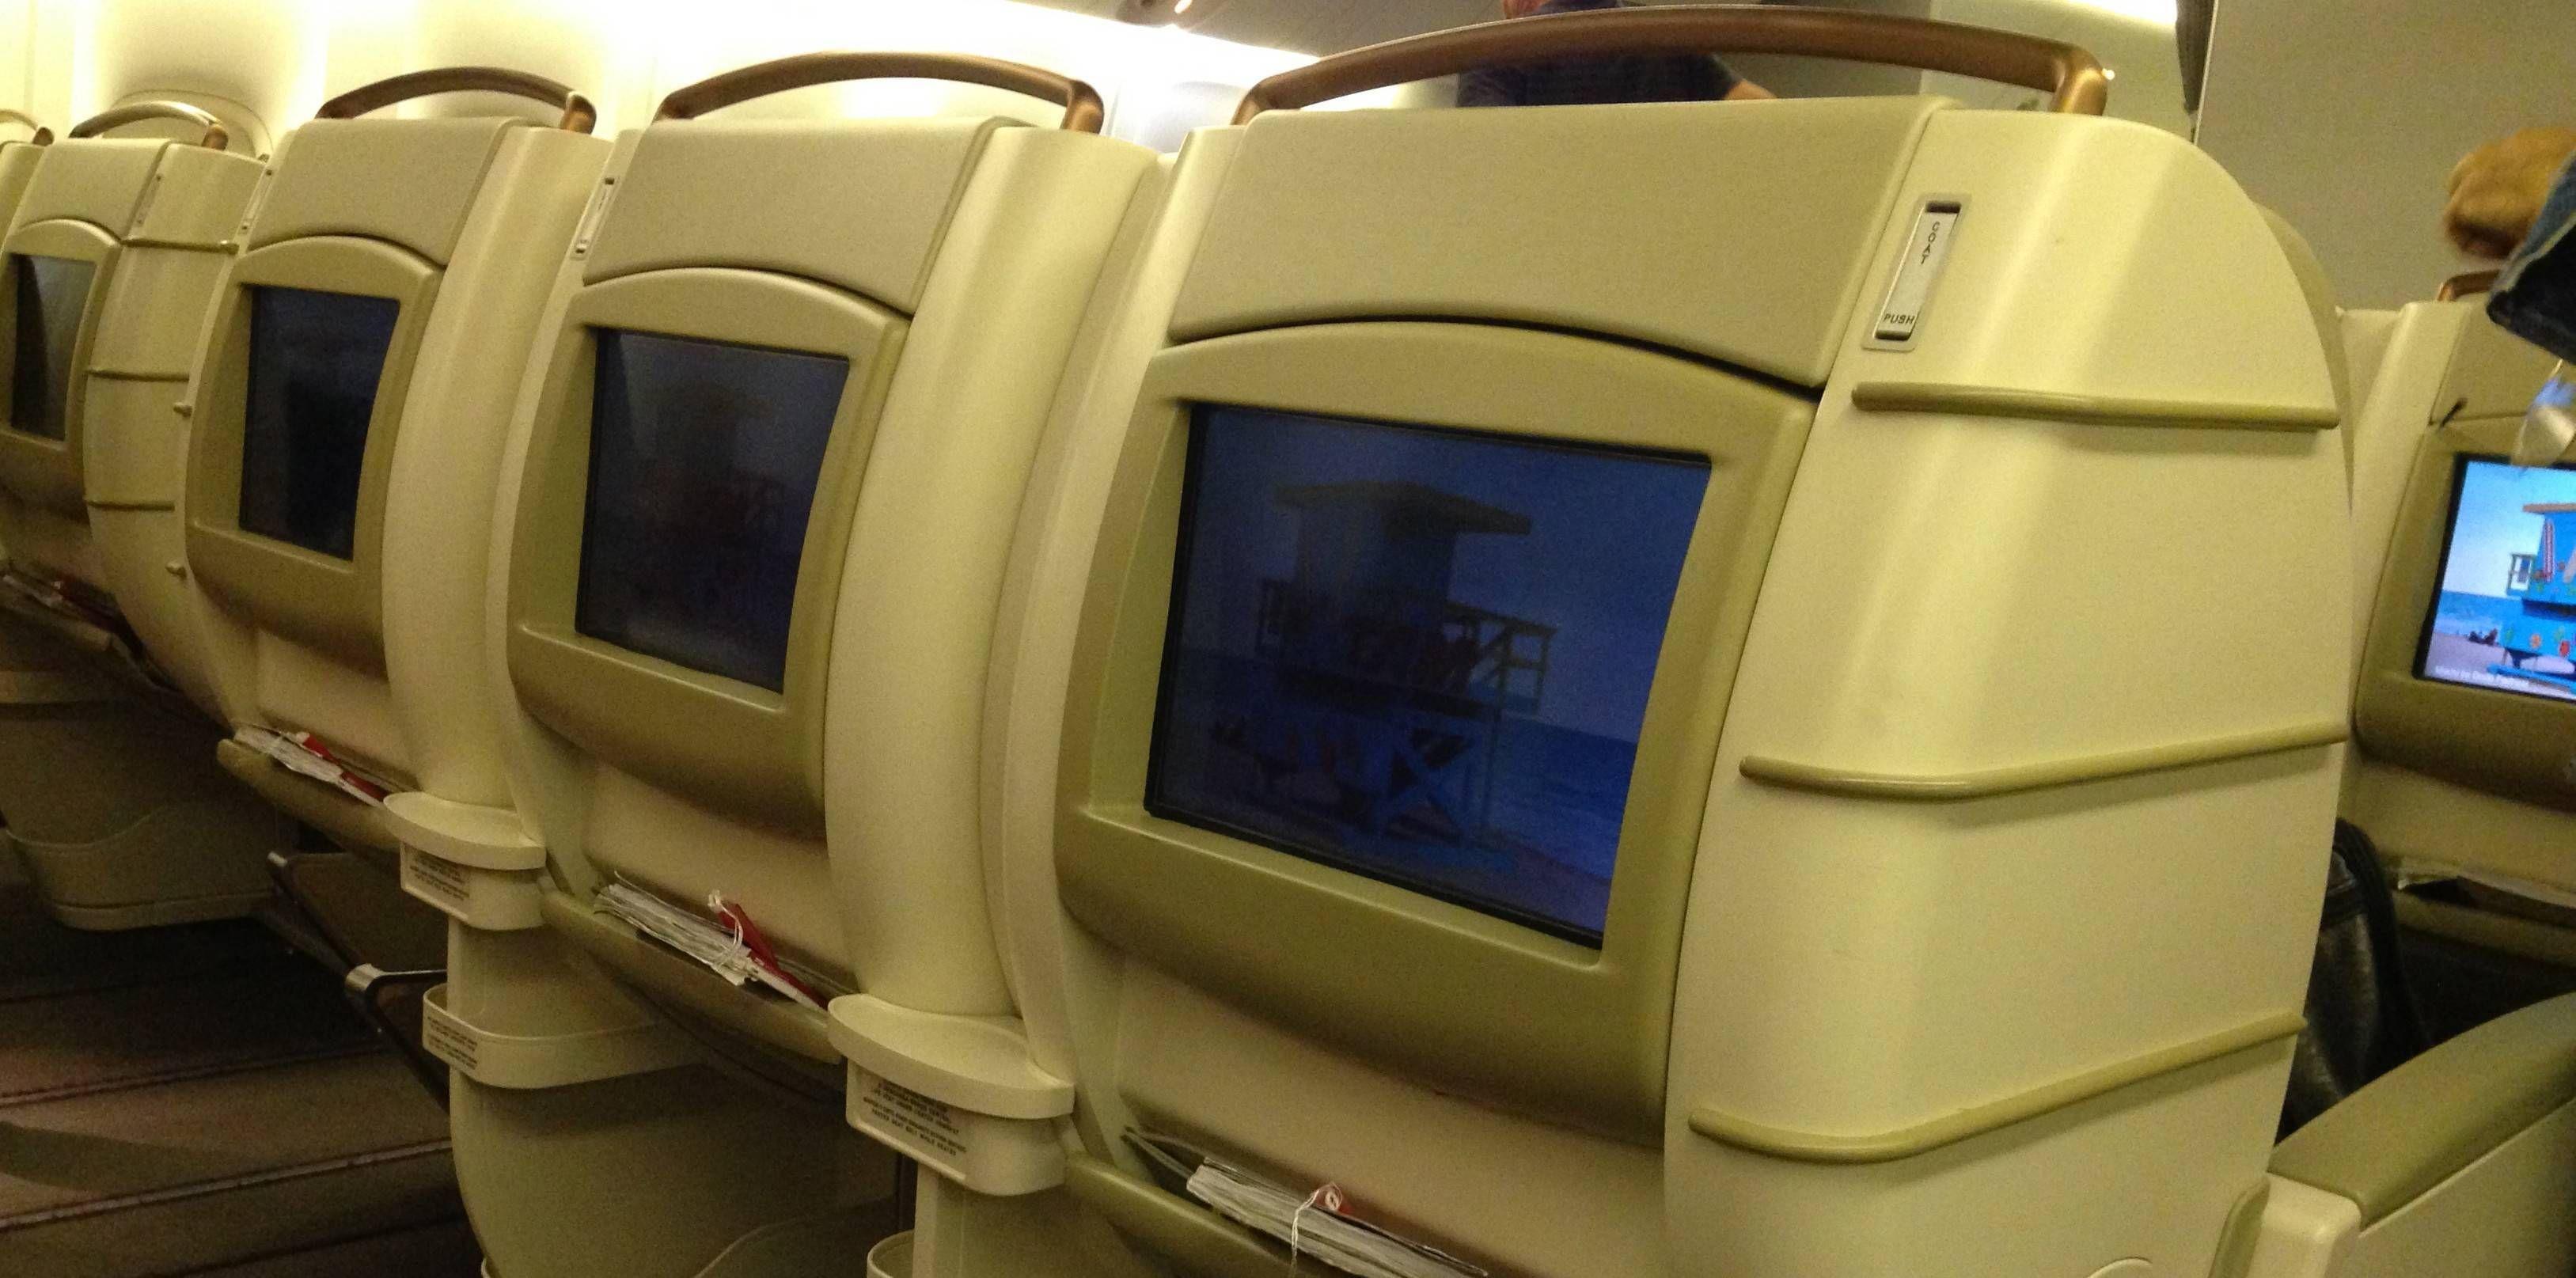 Classe Executiva da TAM no Boeing 777-300